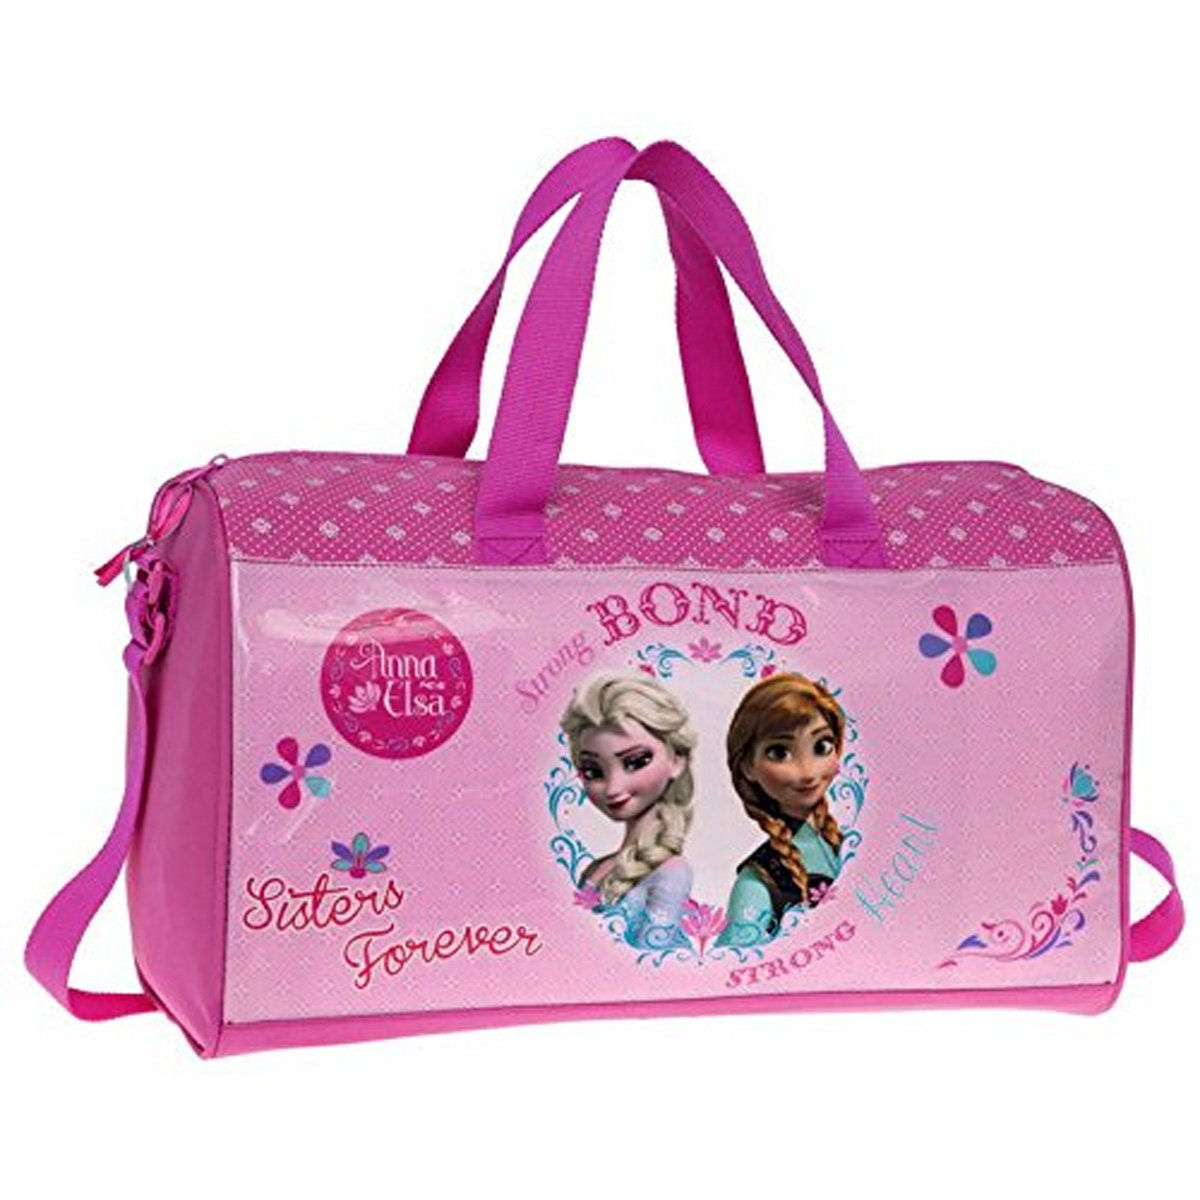 60% de descuento Bolsa viaje Frozen Disney Bond - www.shubhamsorte.xyz 53c3f944ac3